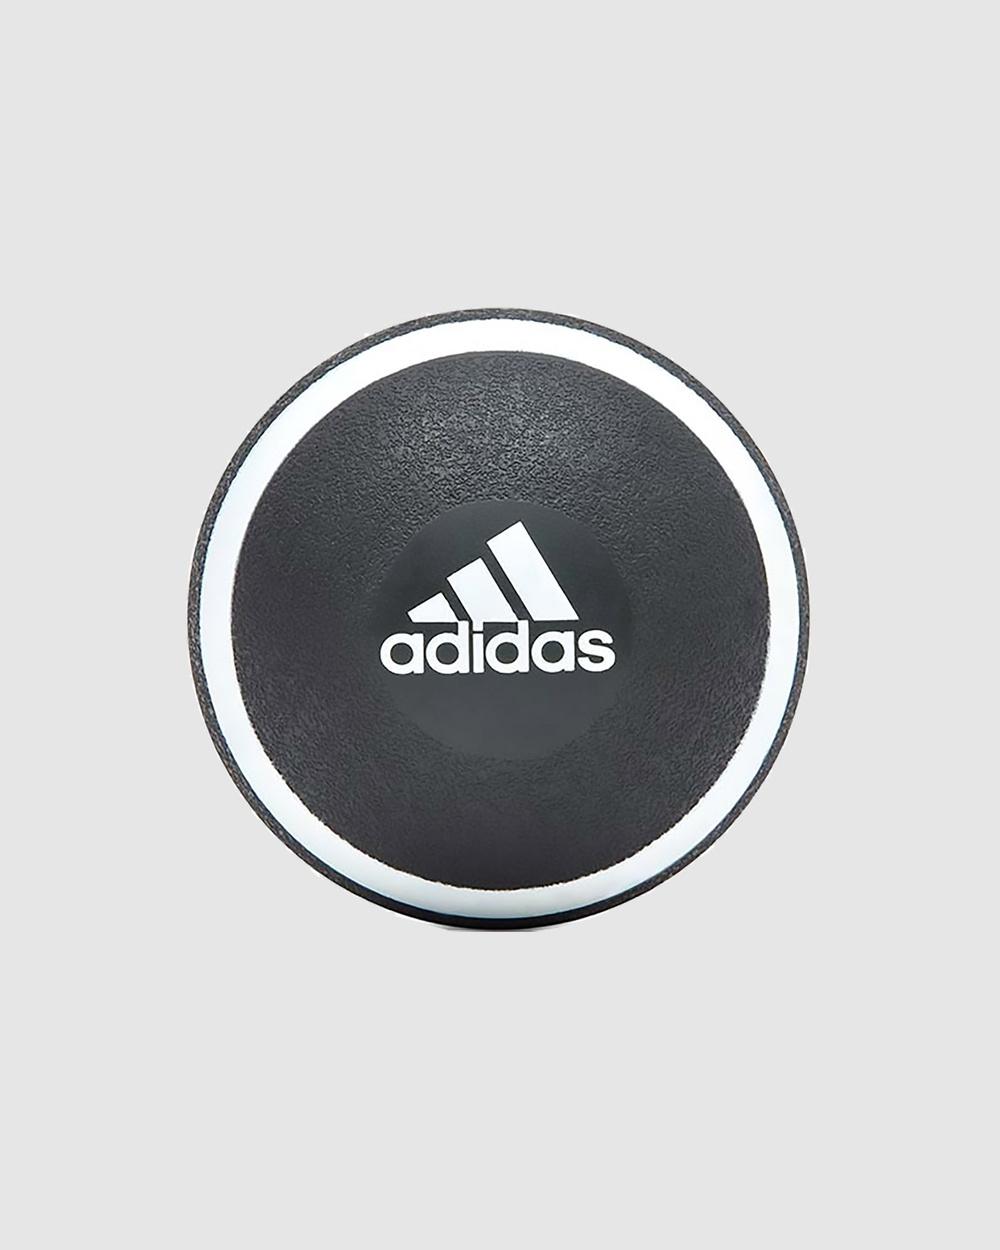 adidas Performance Adidas Massage Ball All boxing Black